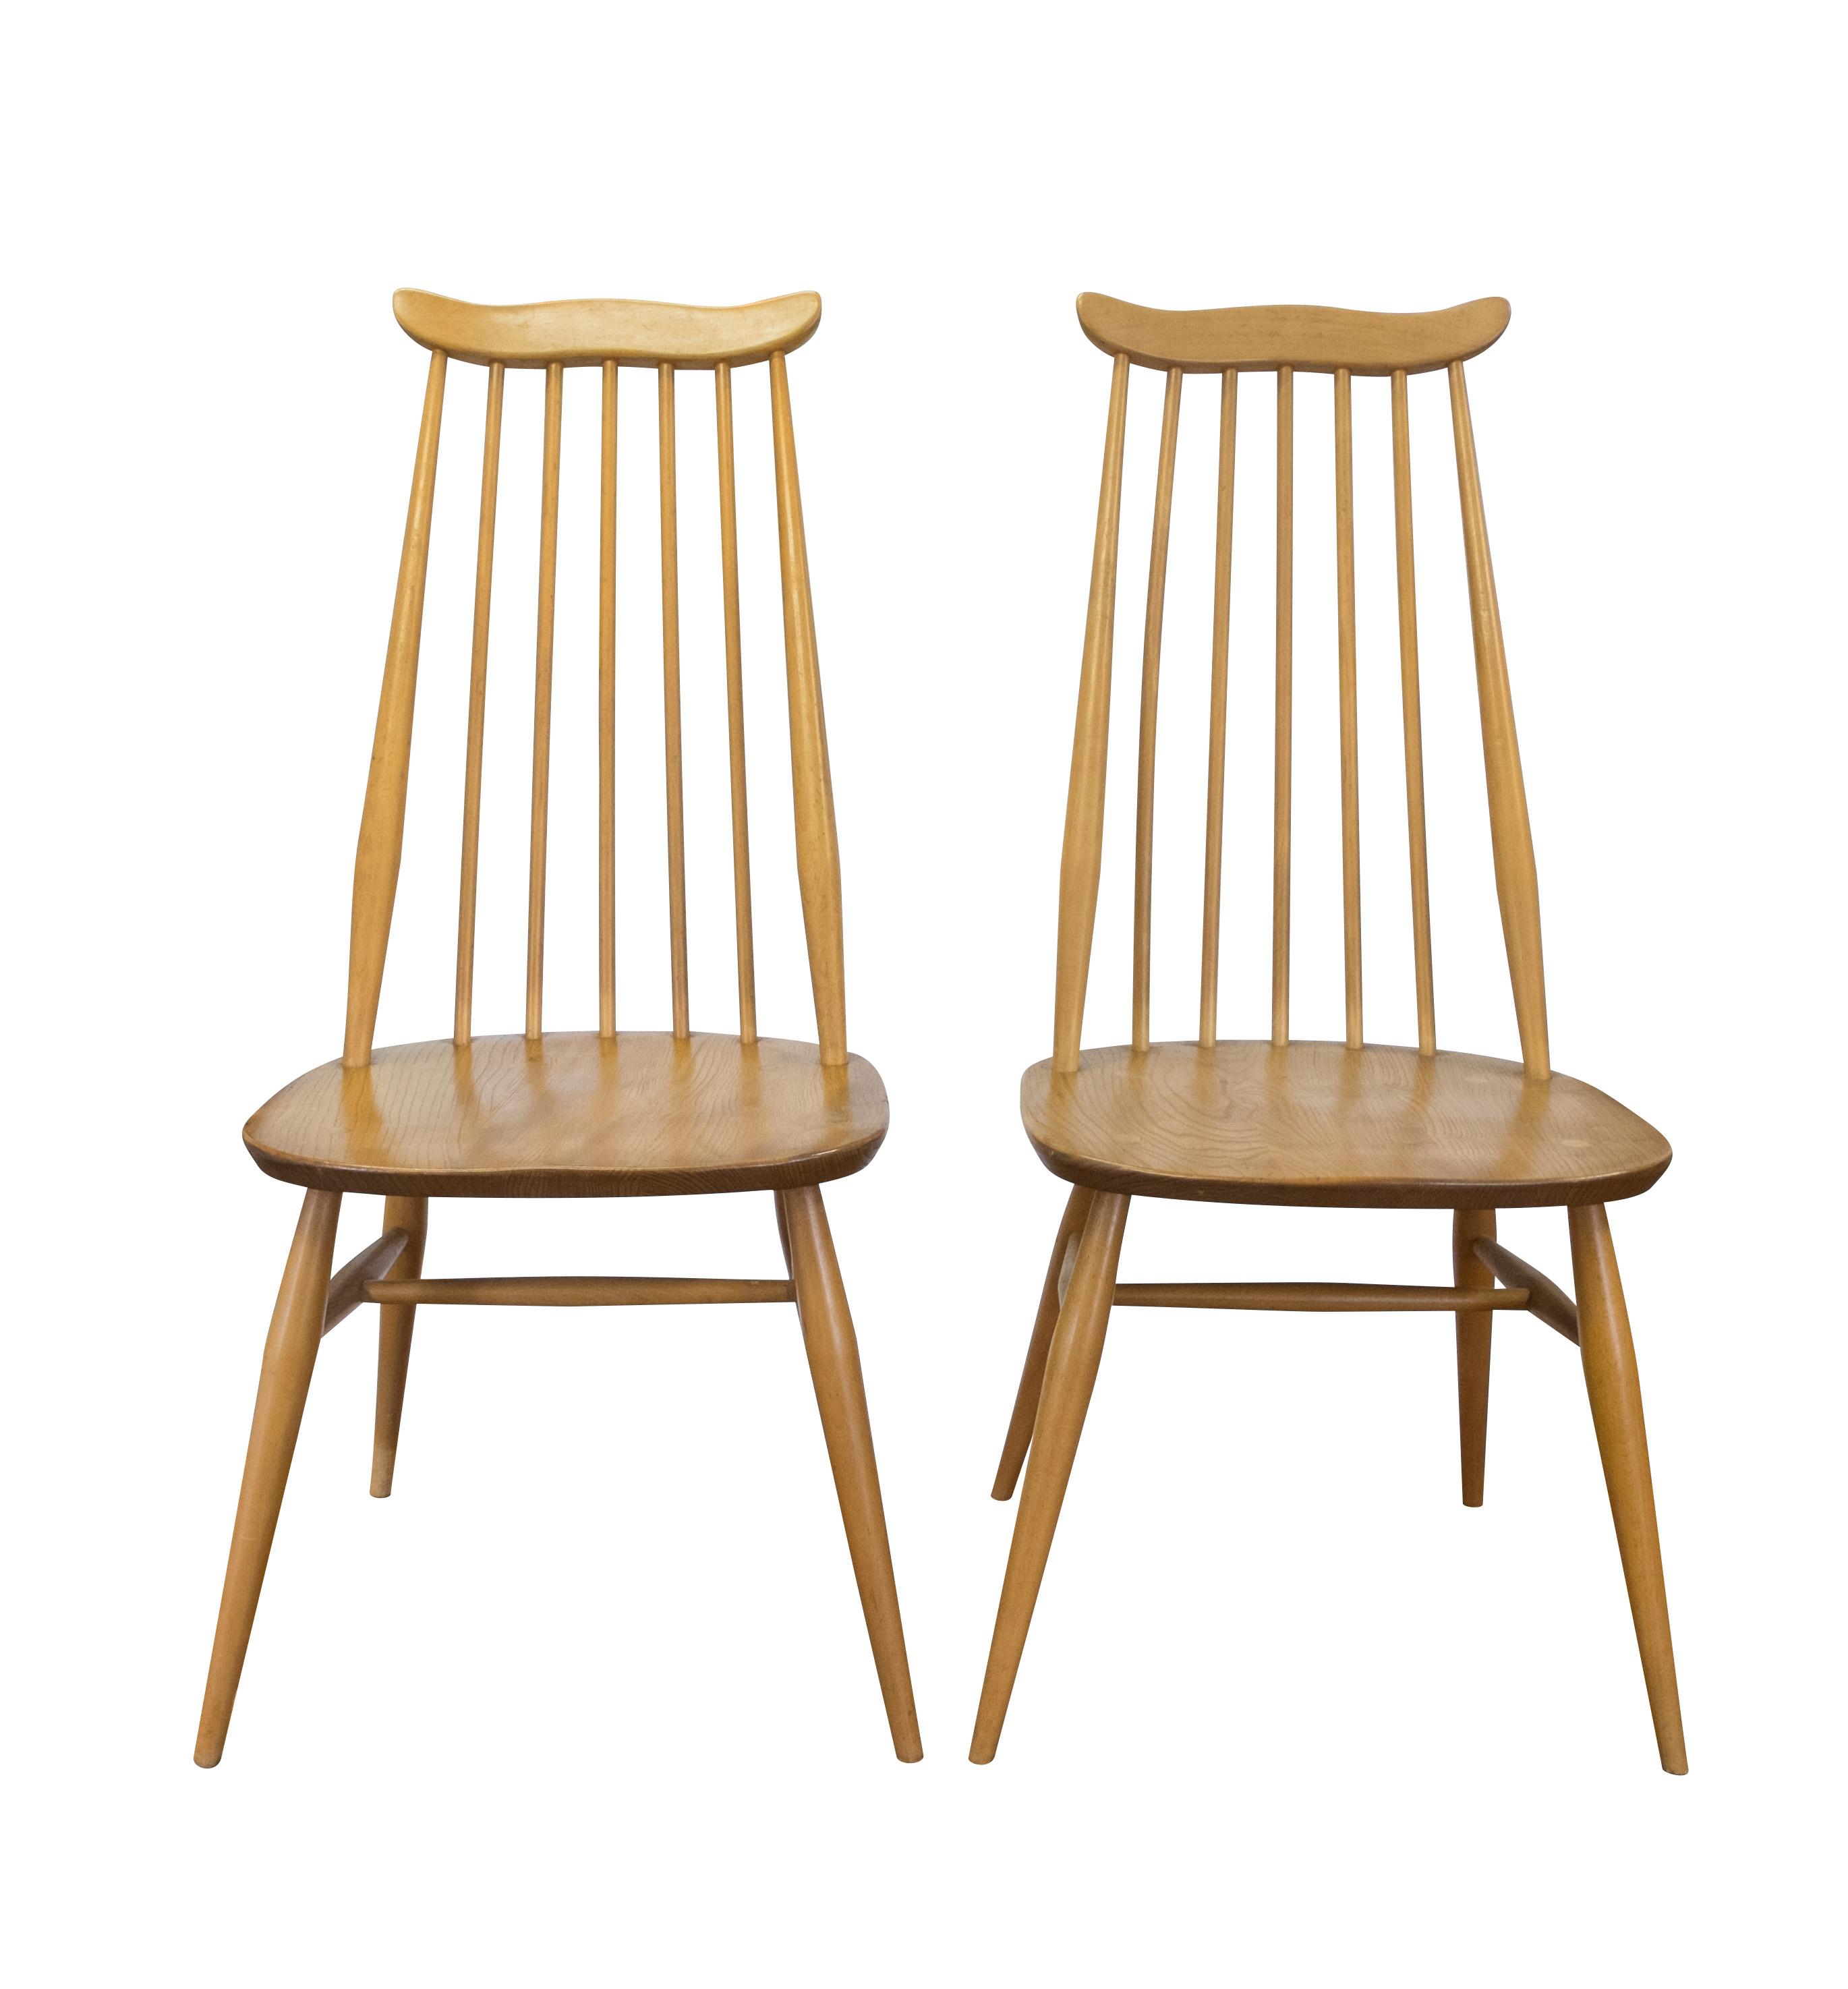 chaise ercol chaise vintage chaise scandinave chaises anglaises chaises pas cheres vintage chaise barreaux chaise danoise room 30 mobilier vintage - Chaise Danoise